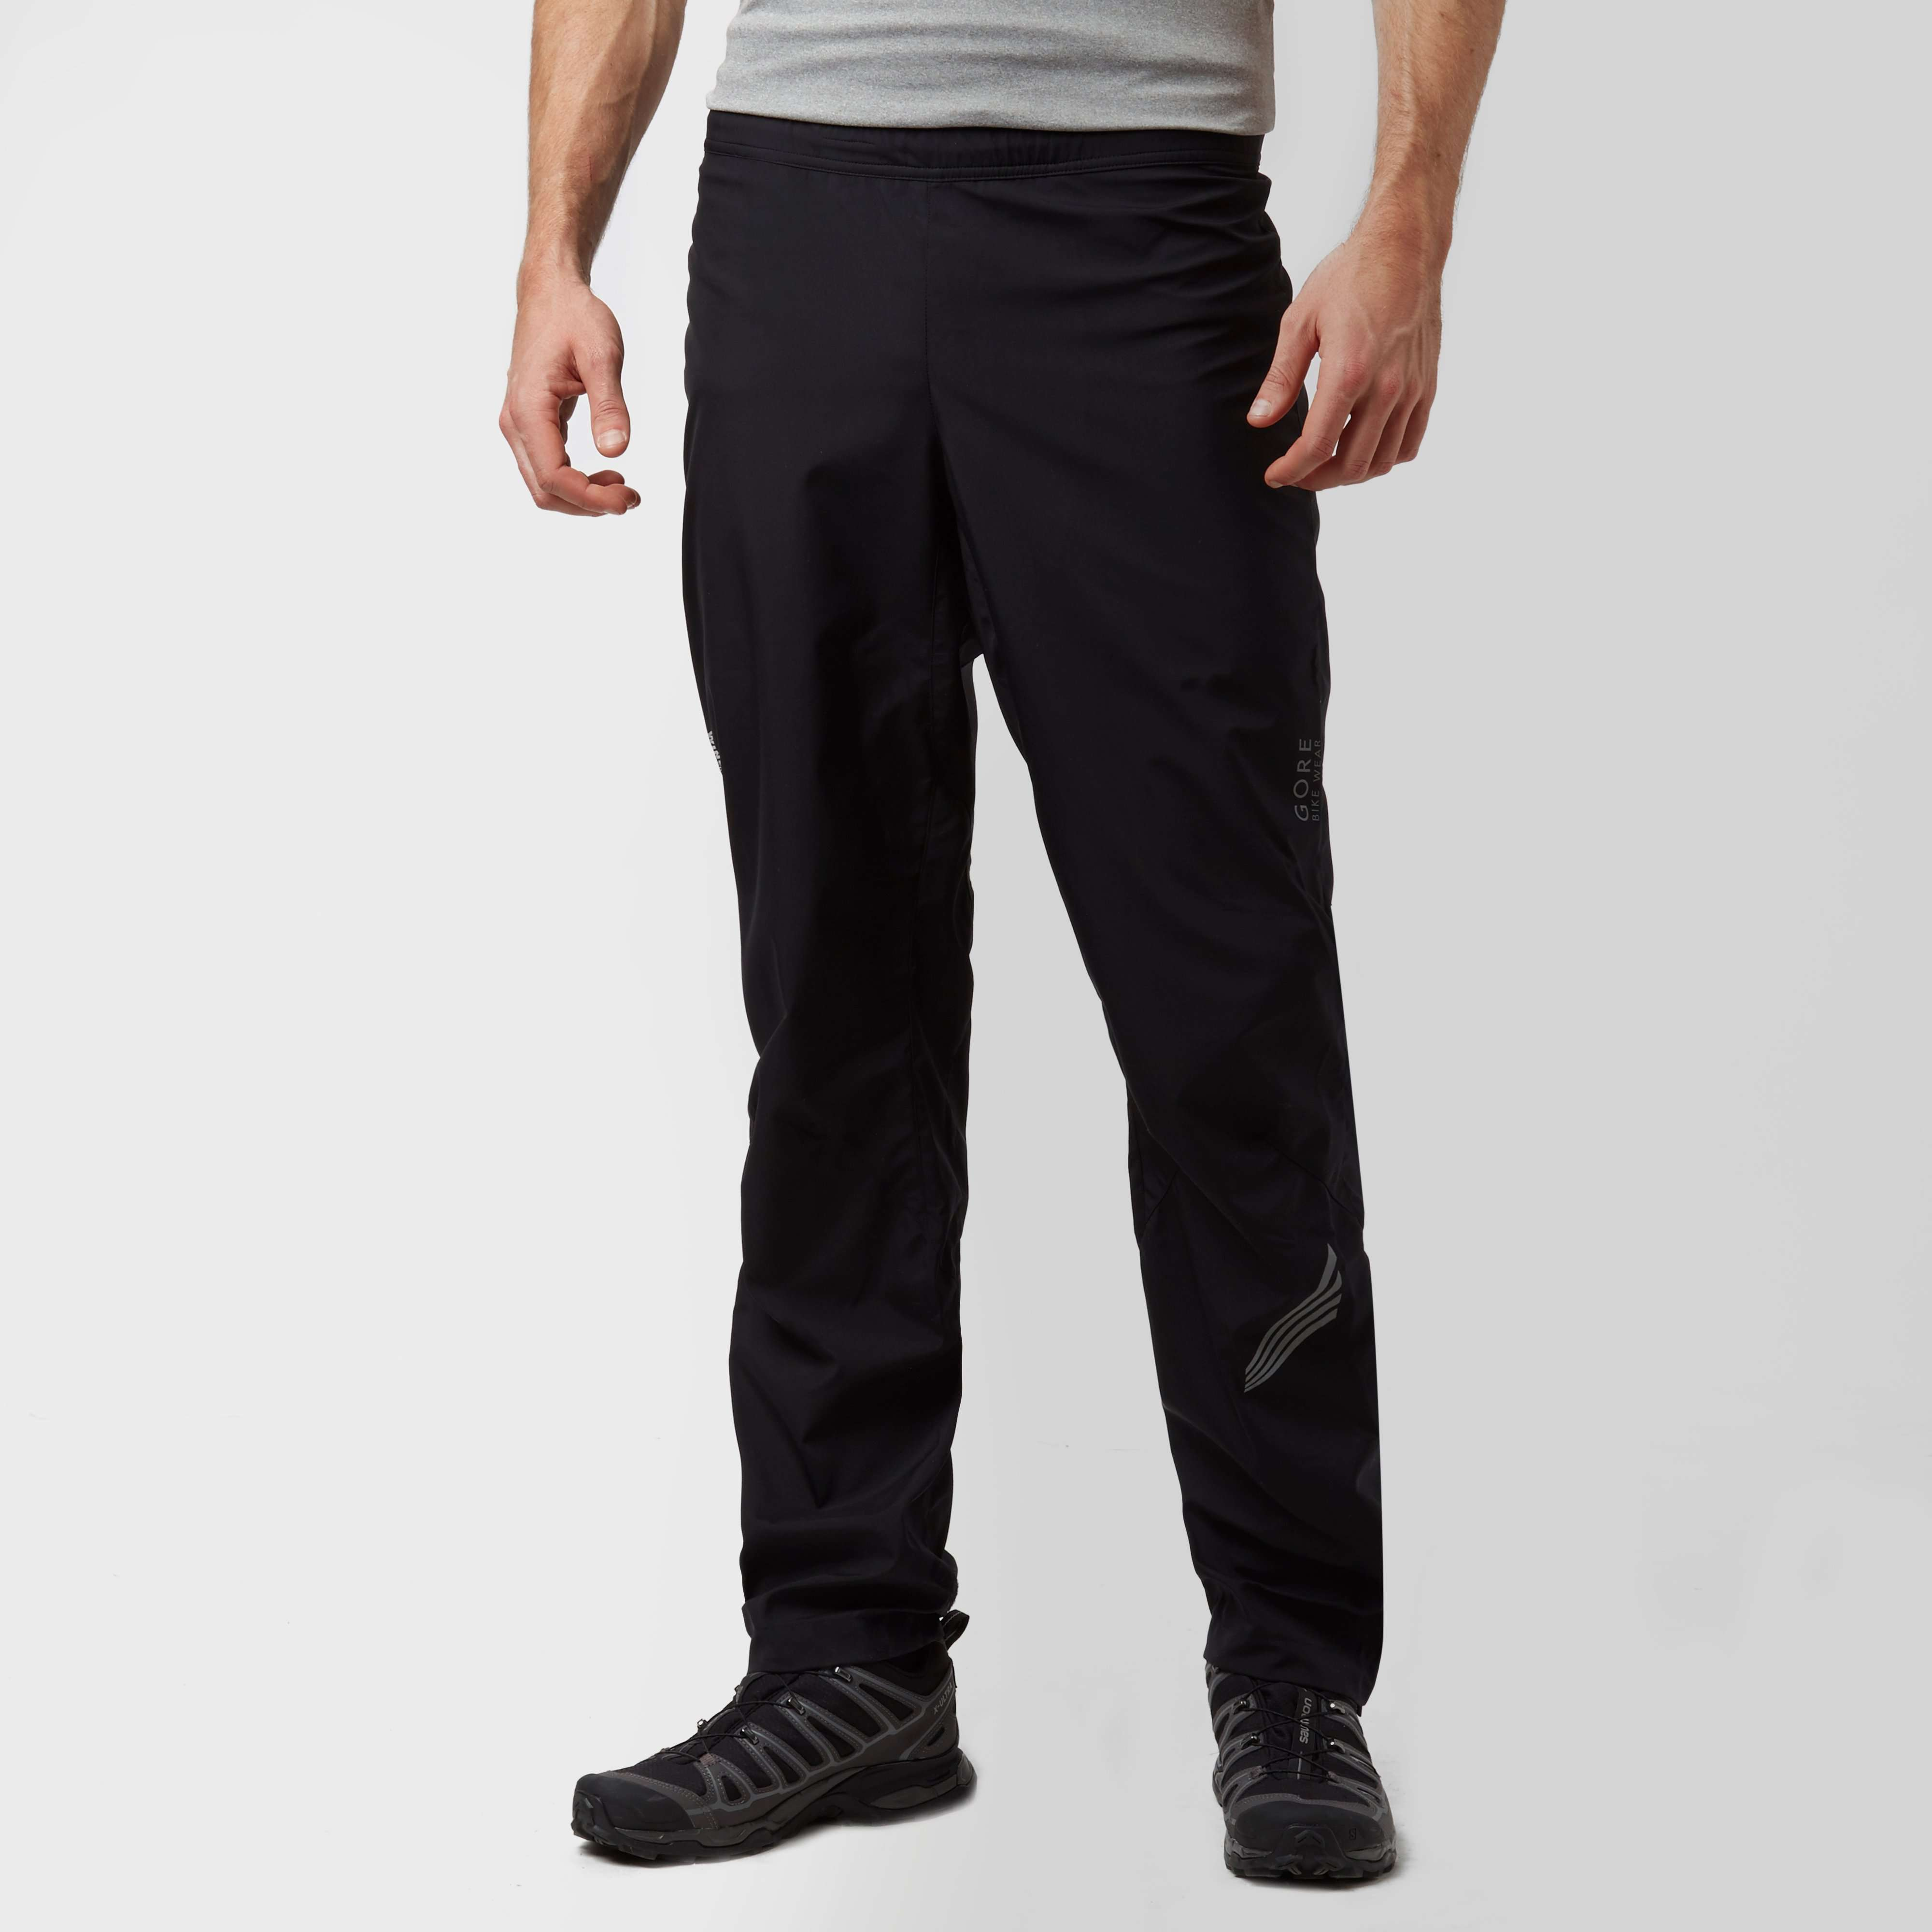 GORE Men's Element Windstopper® Active Shell Pants